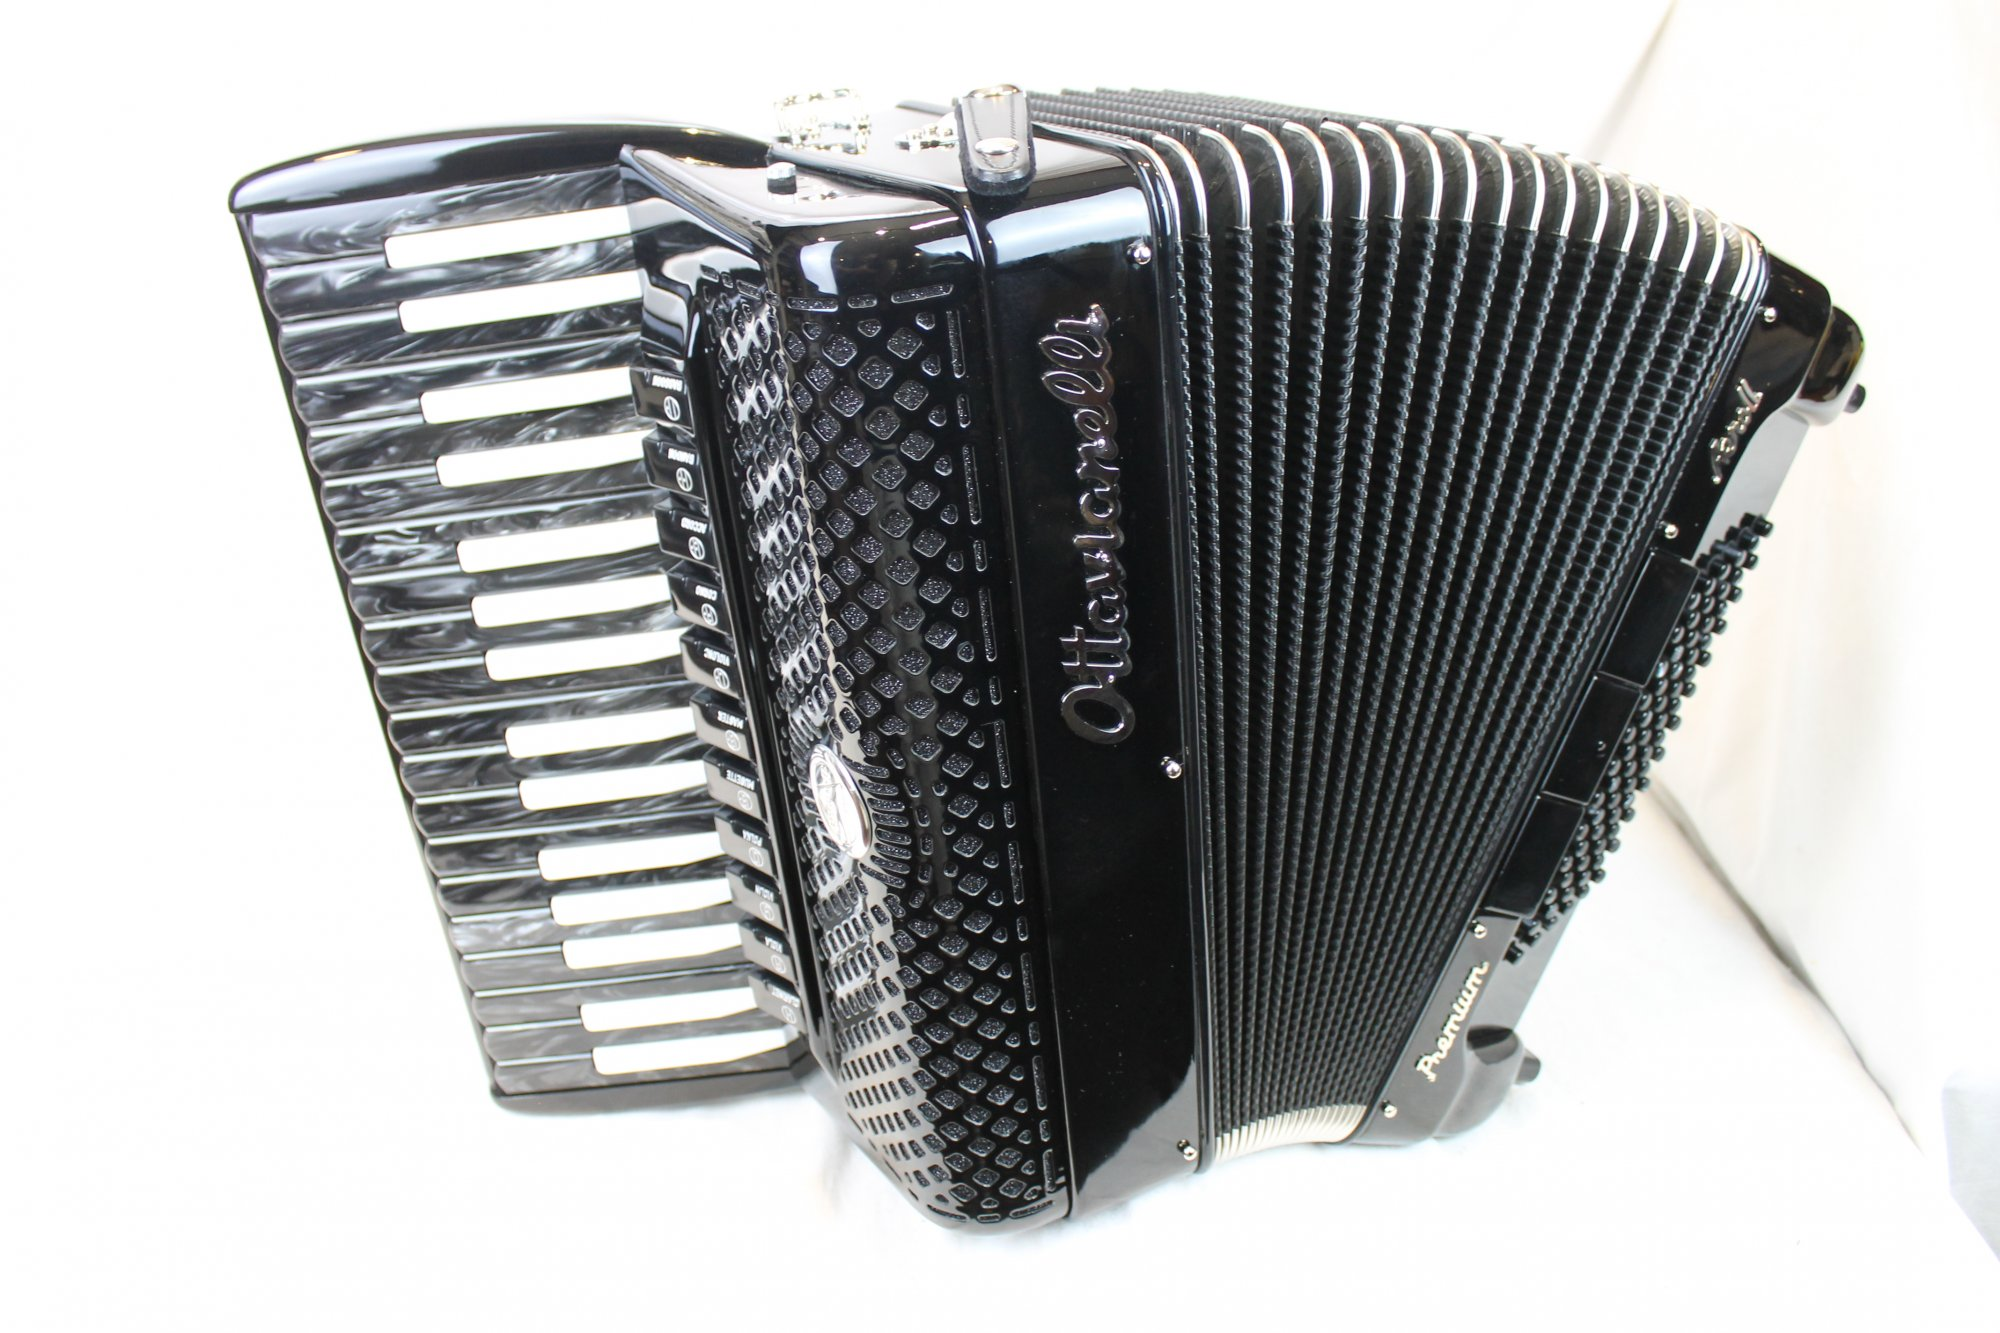 NEW Black Inverted Ottavianelli Aero II Piano Accordion LMMM 34 72